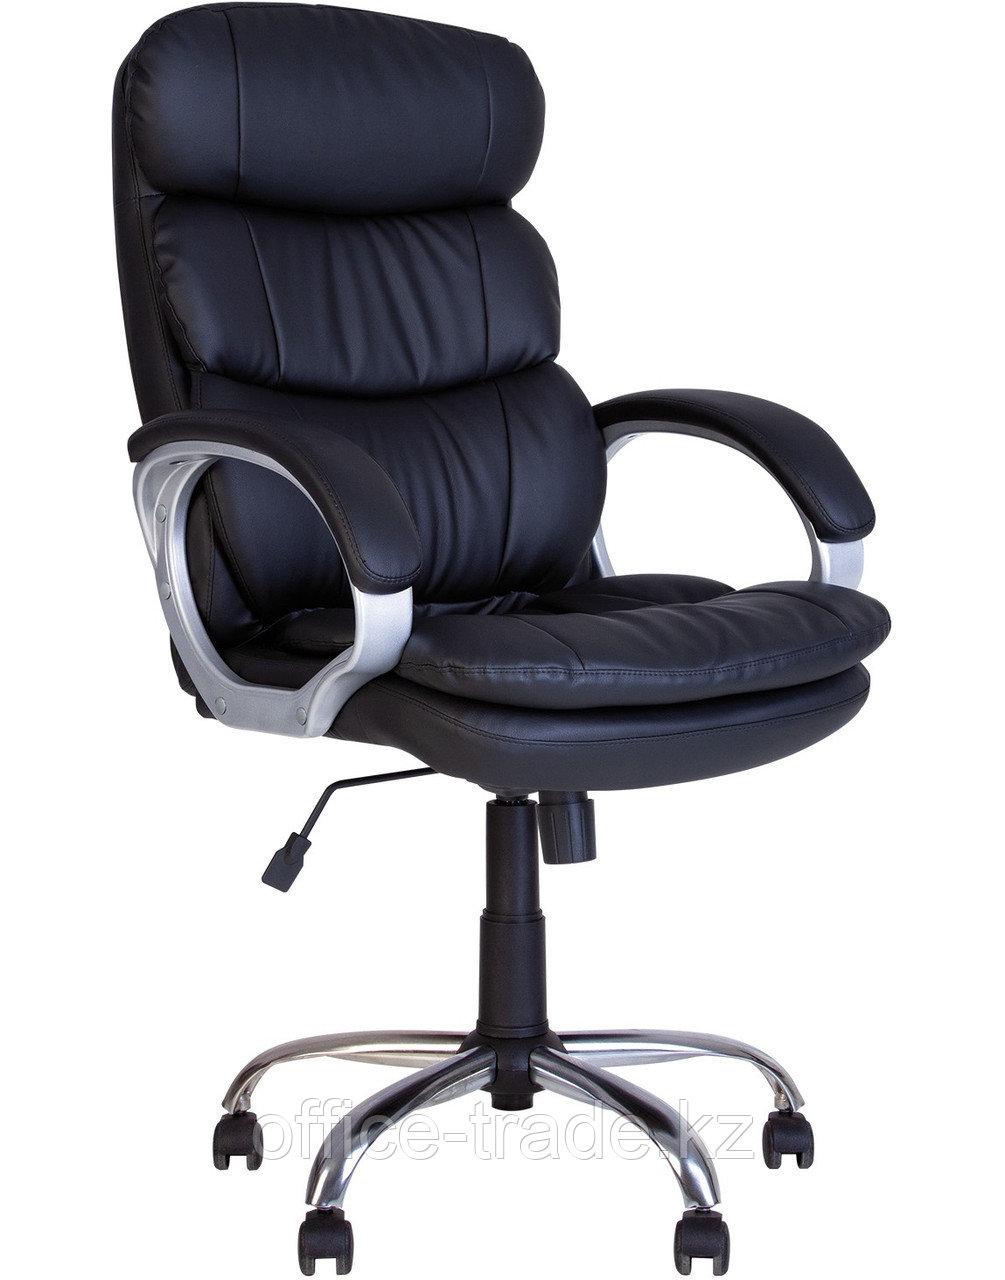 Кресло руководителя Dolce Chrome Eco